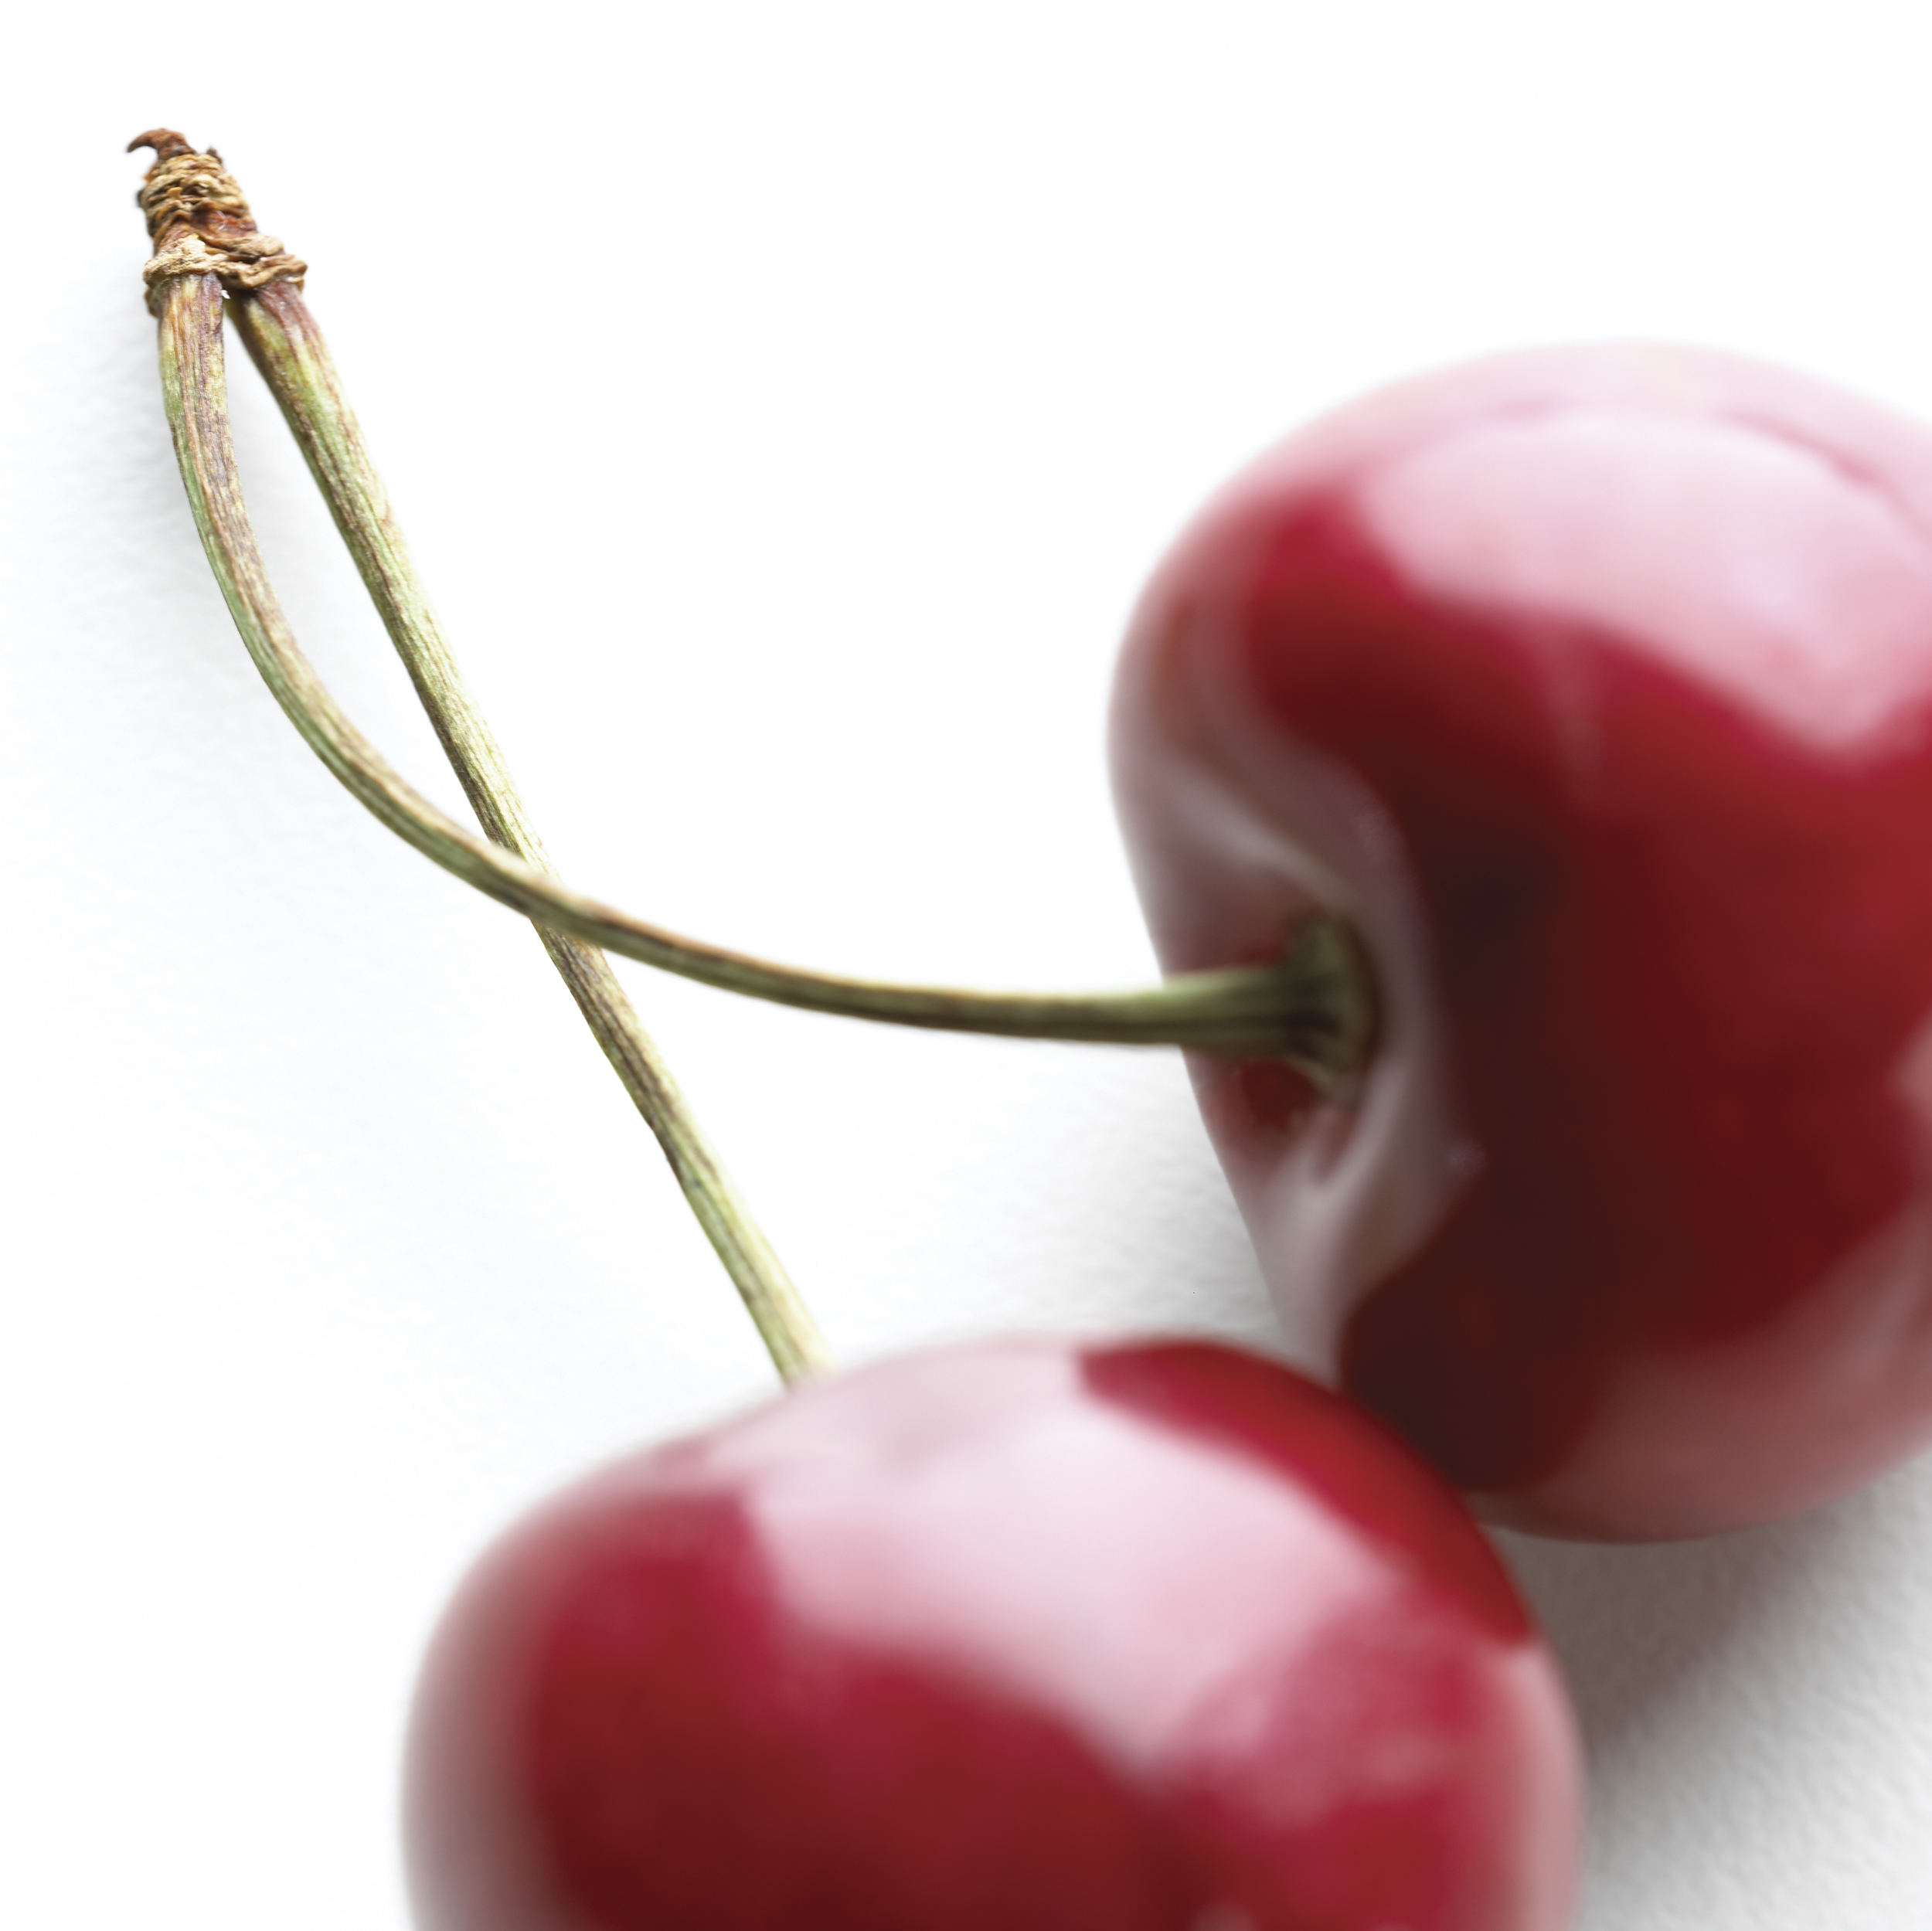 Cherries-22458.jpg